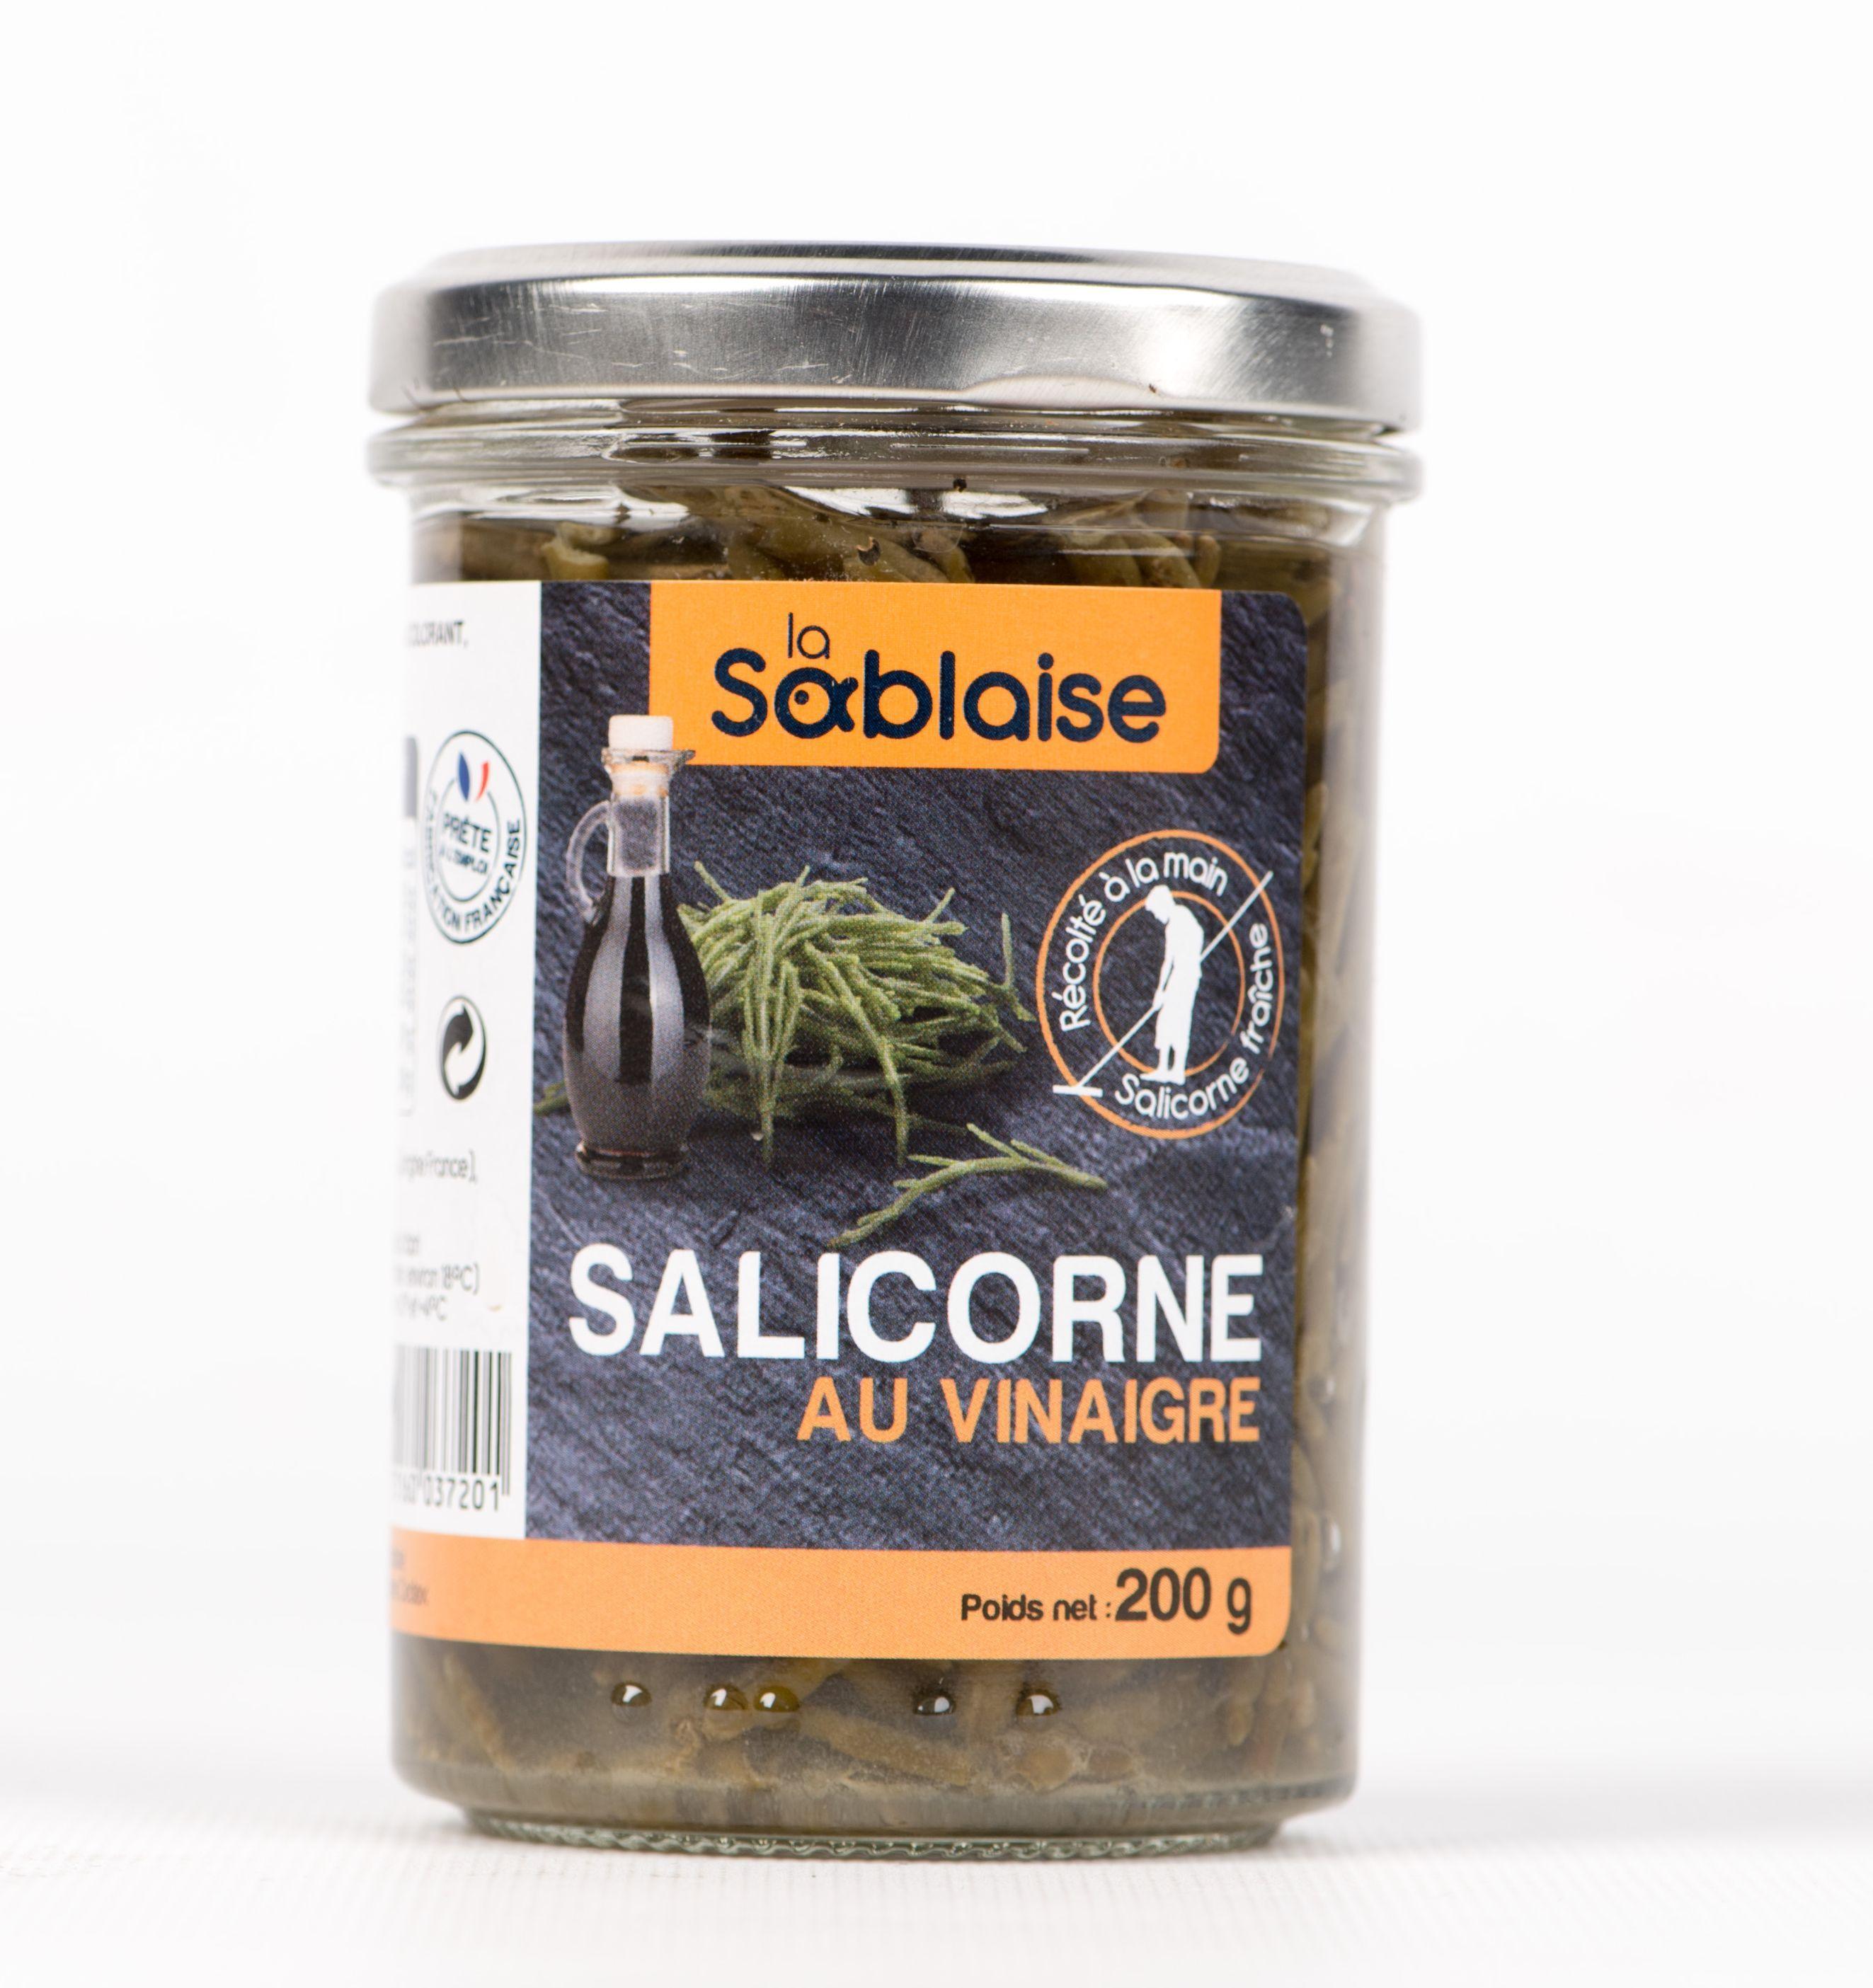 Salicornes au vinaigre, La Sablaise (200 g)